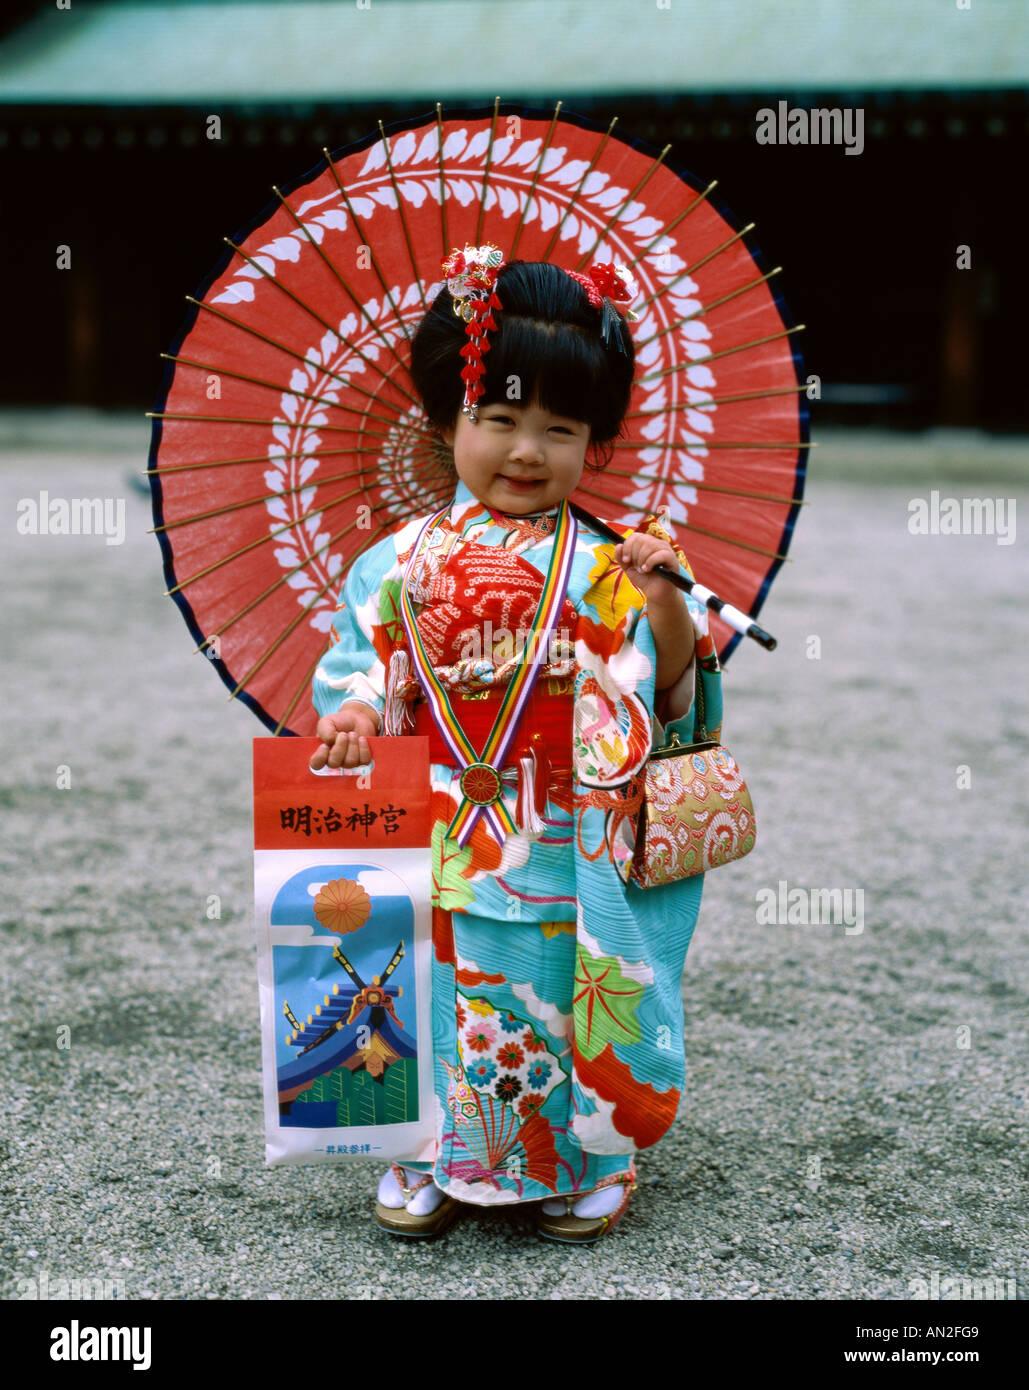 Shichi-go-san: 7-5-3 Day on November 15th